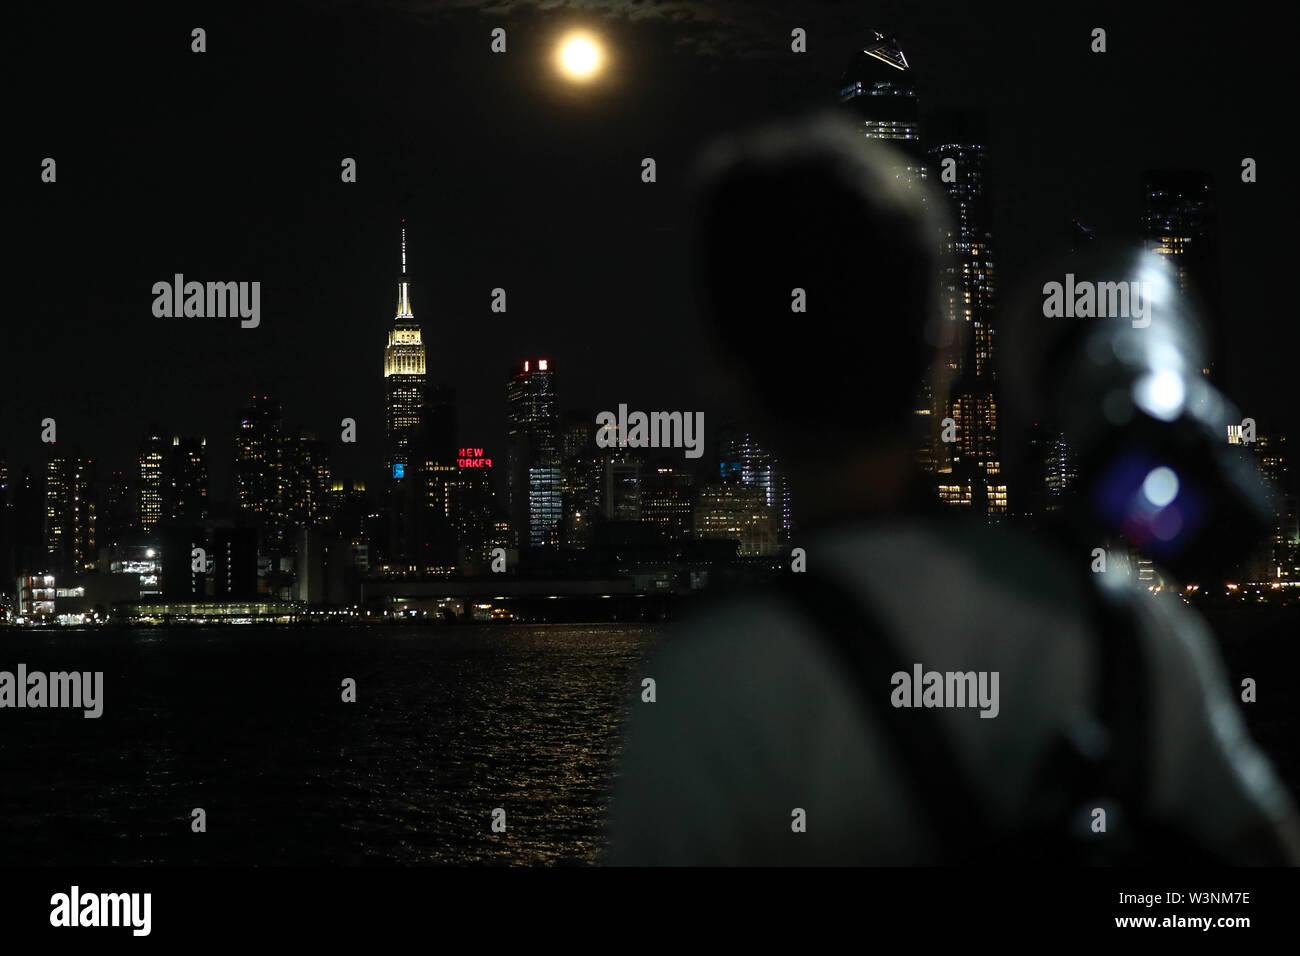 Hoboken, New Jersey, USA  16th July, 2019  Full moon is seen